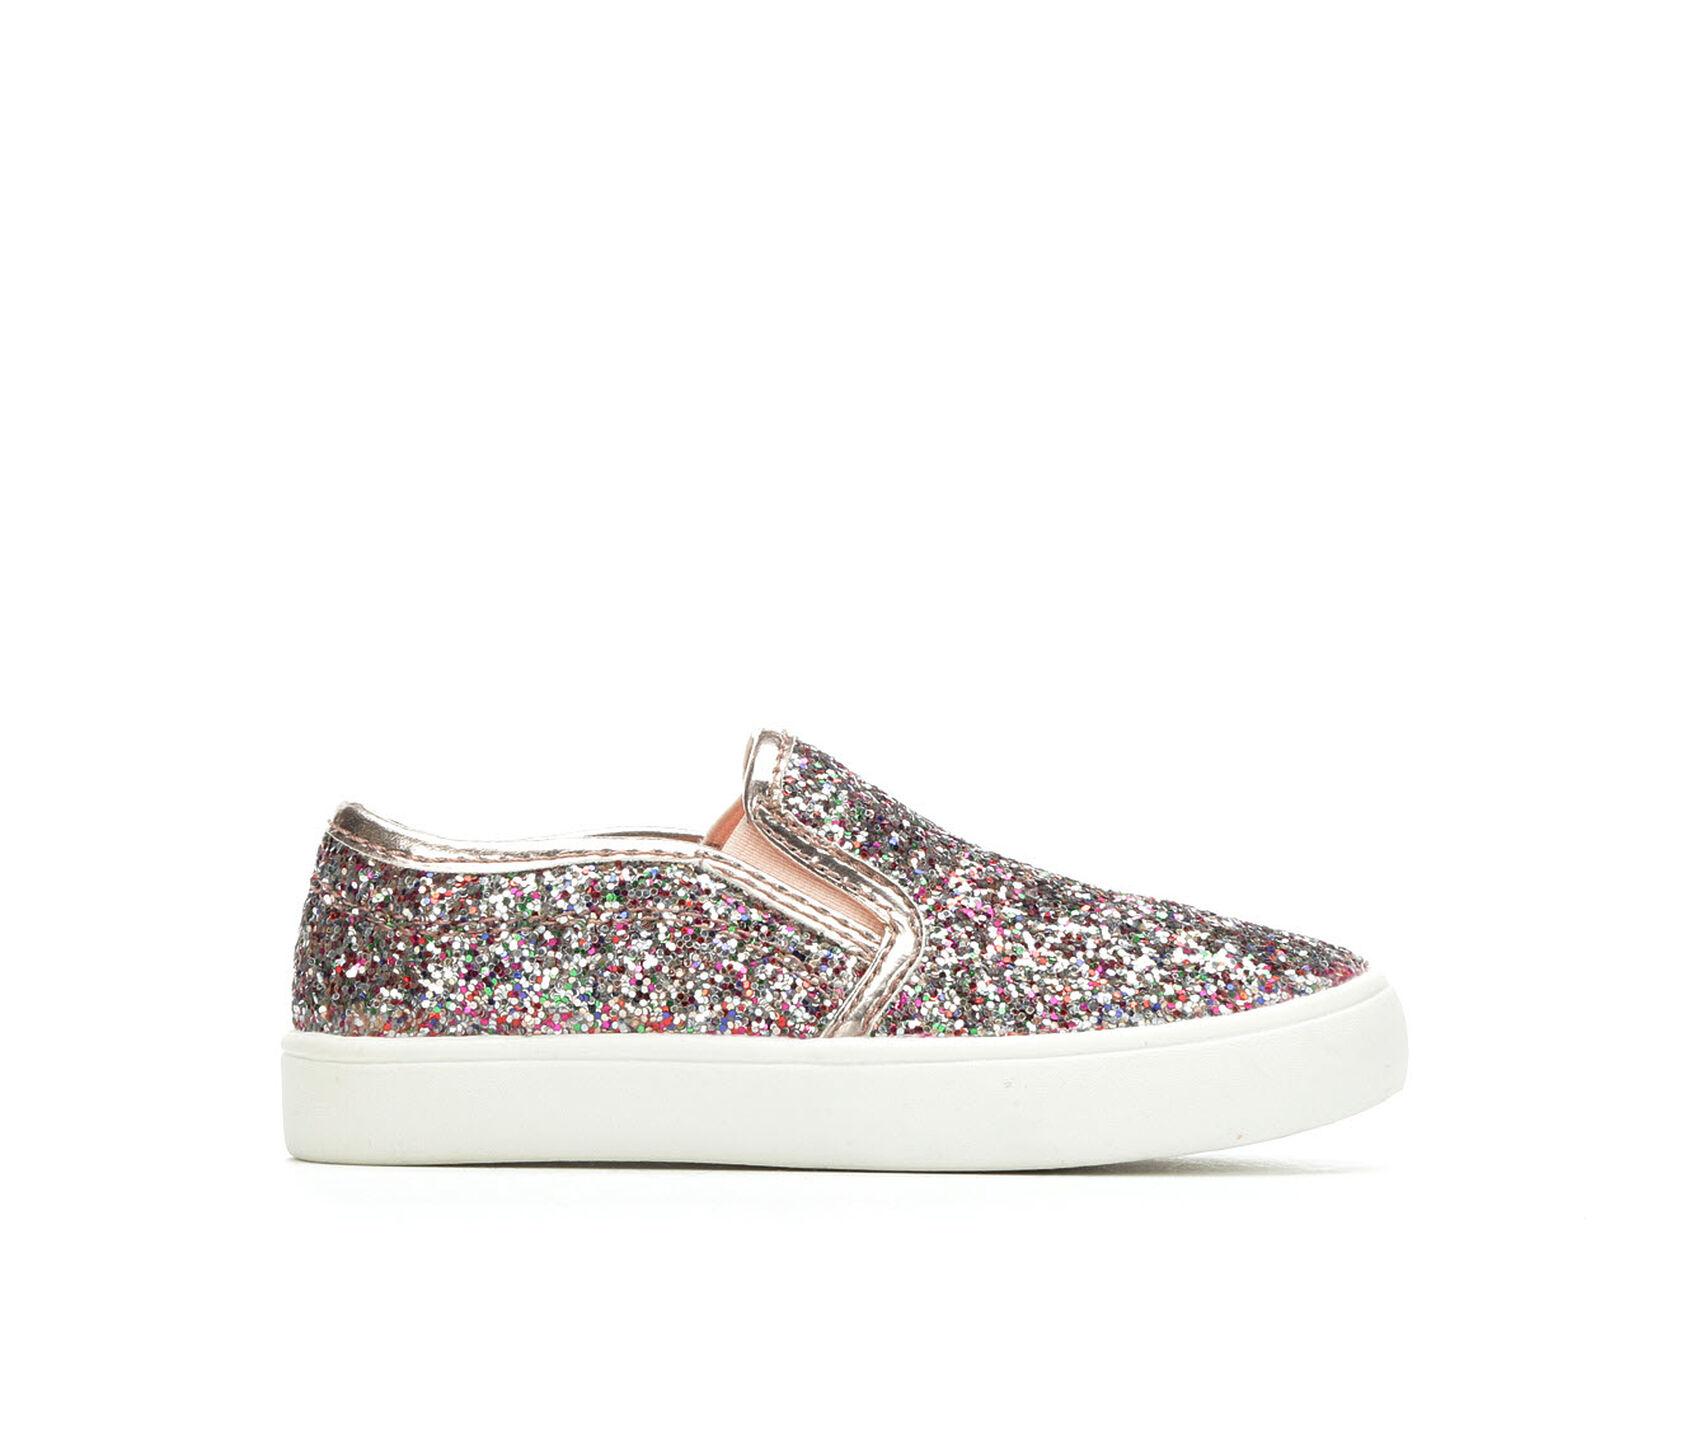 28a64779e5f7 Girls' Carters Toddler & Little Kid Tween7 Shoes | Shoe Carnival